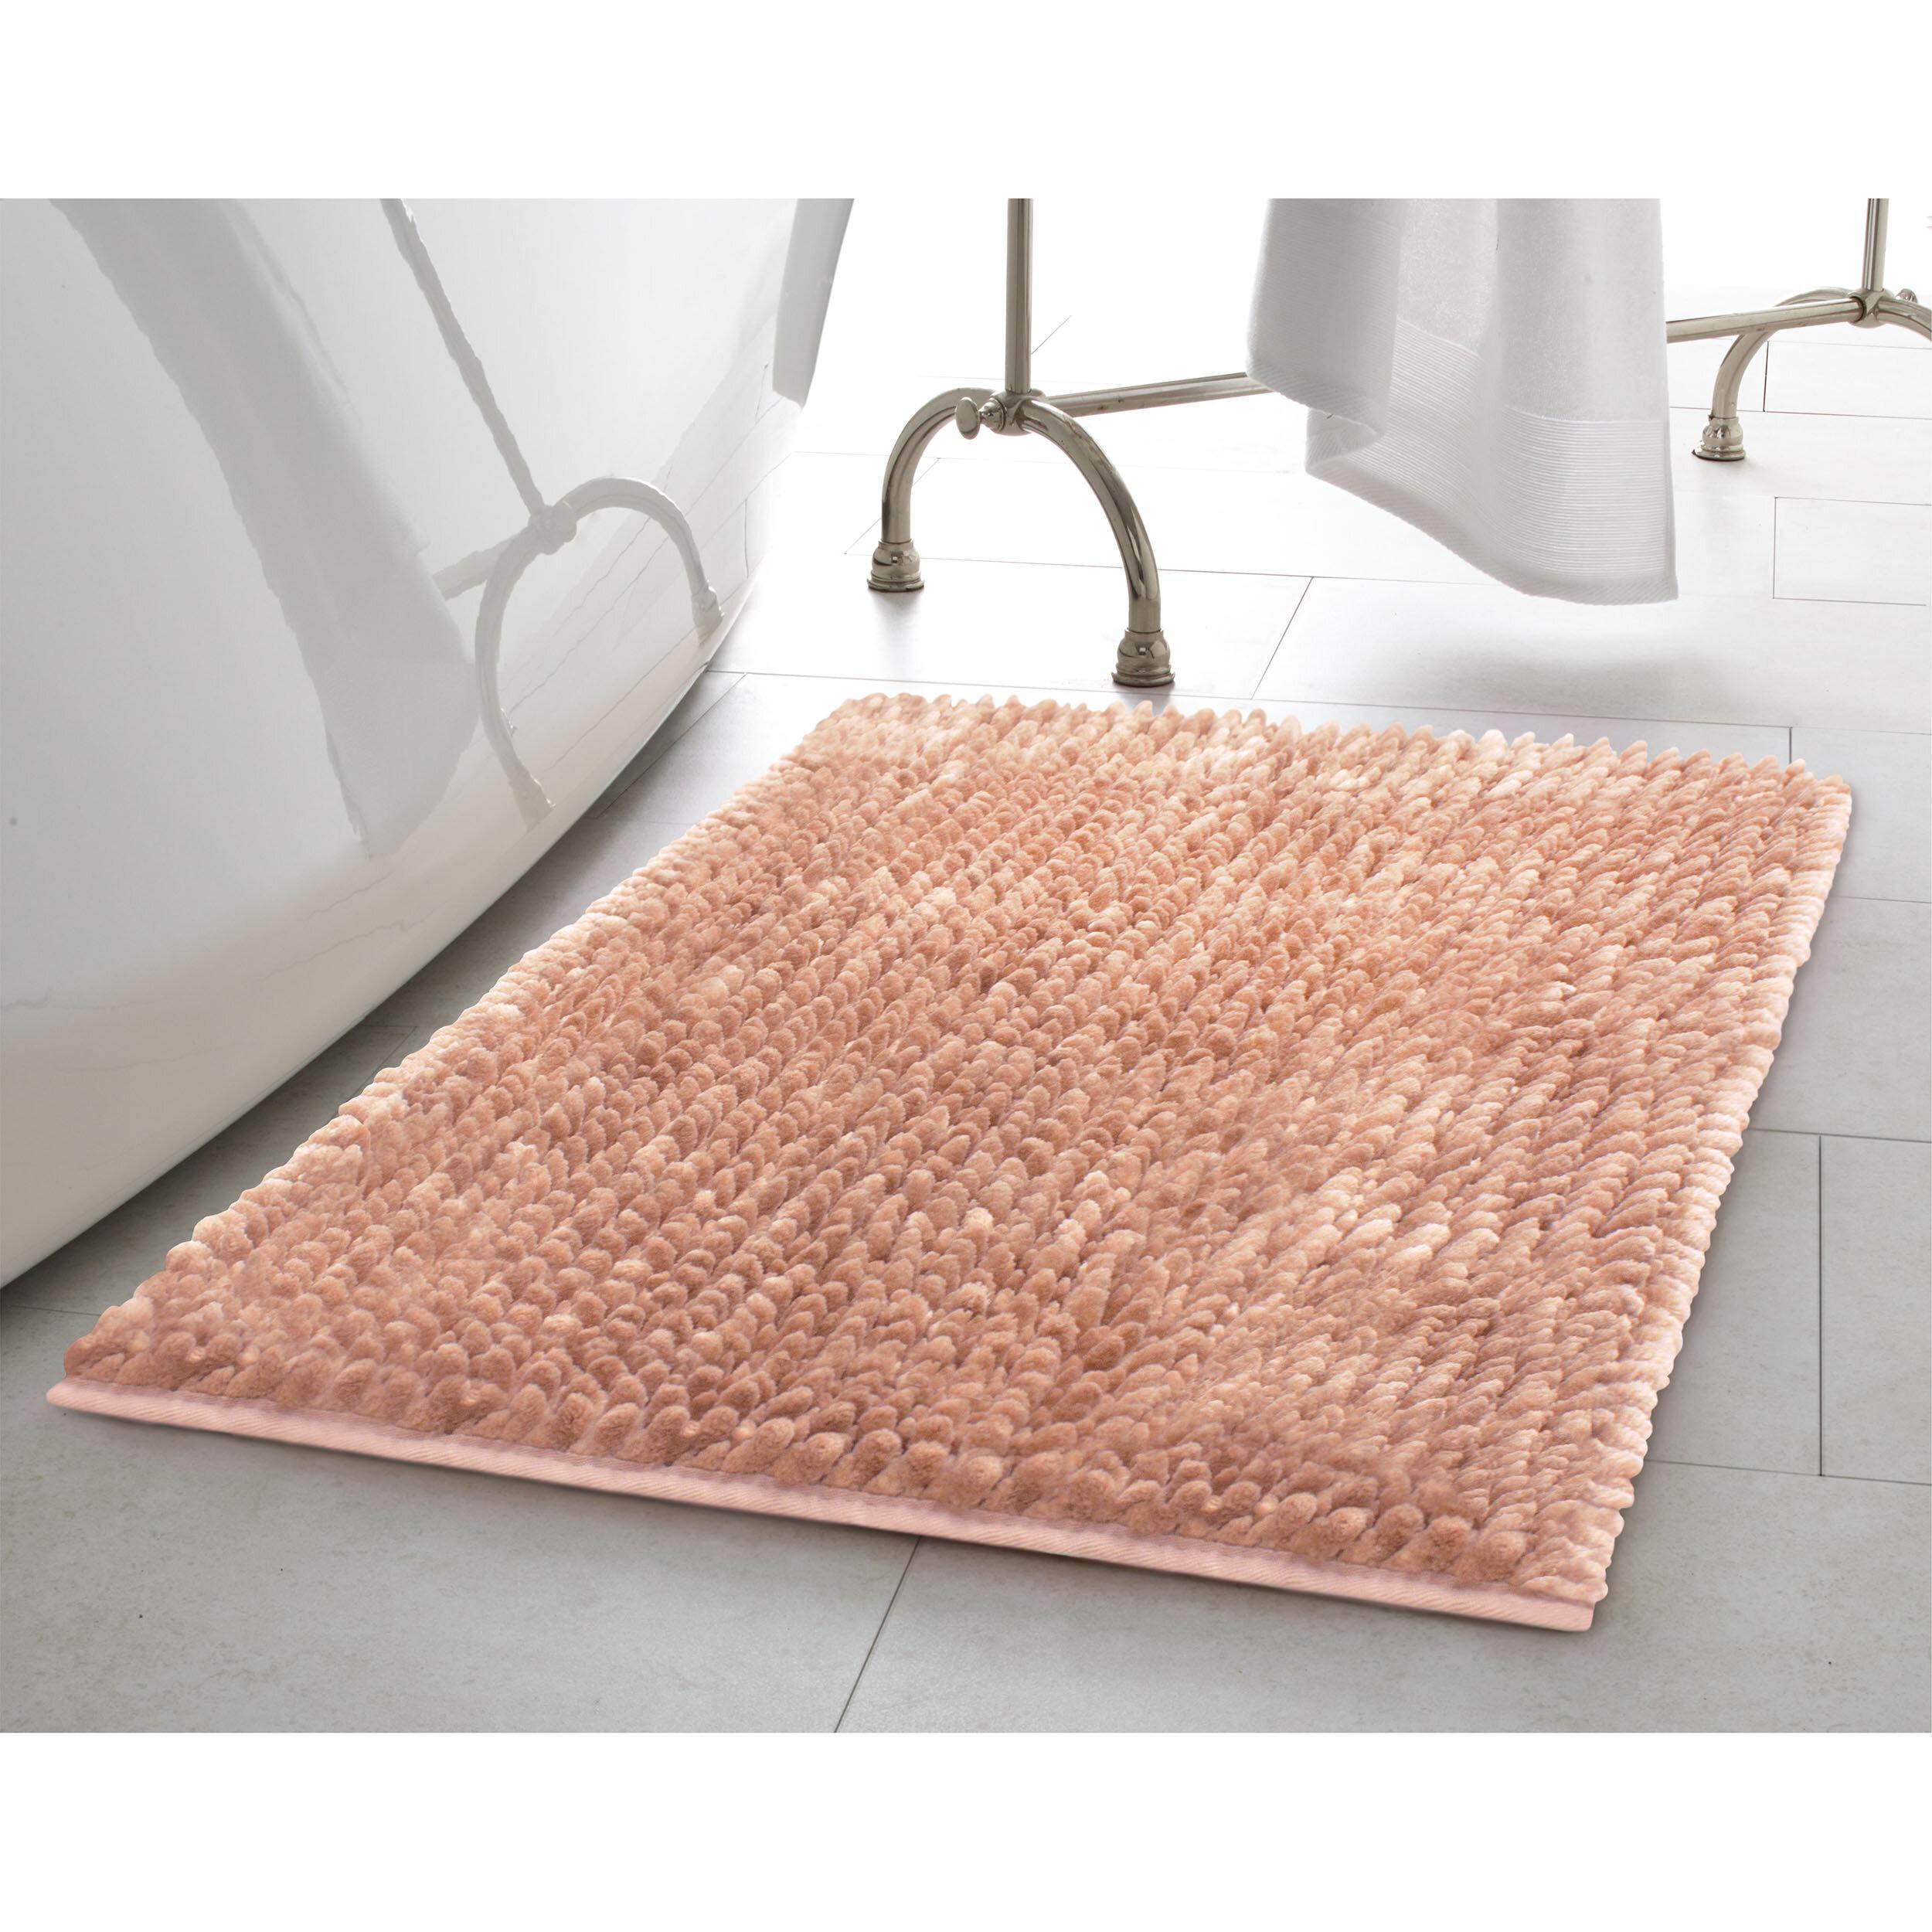 Pink Bath Rugs Mats On Sale Wayfair